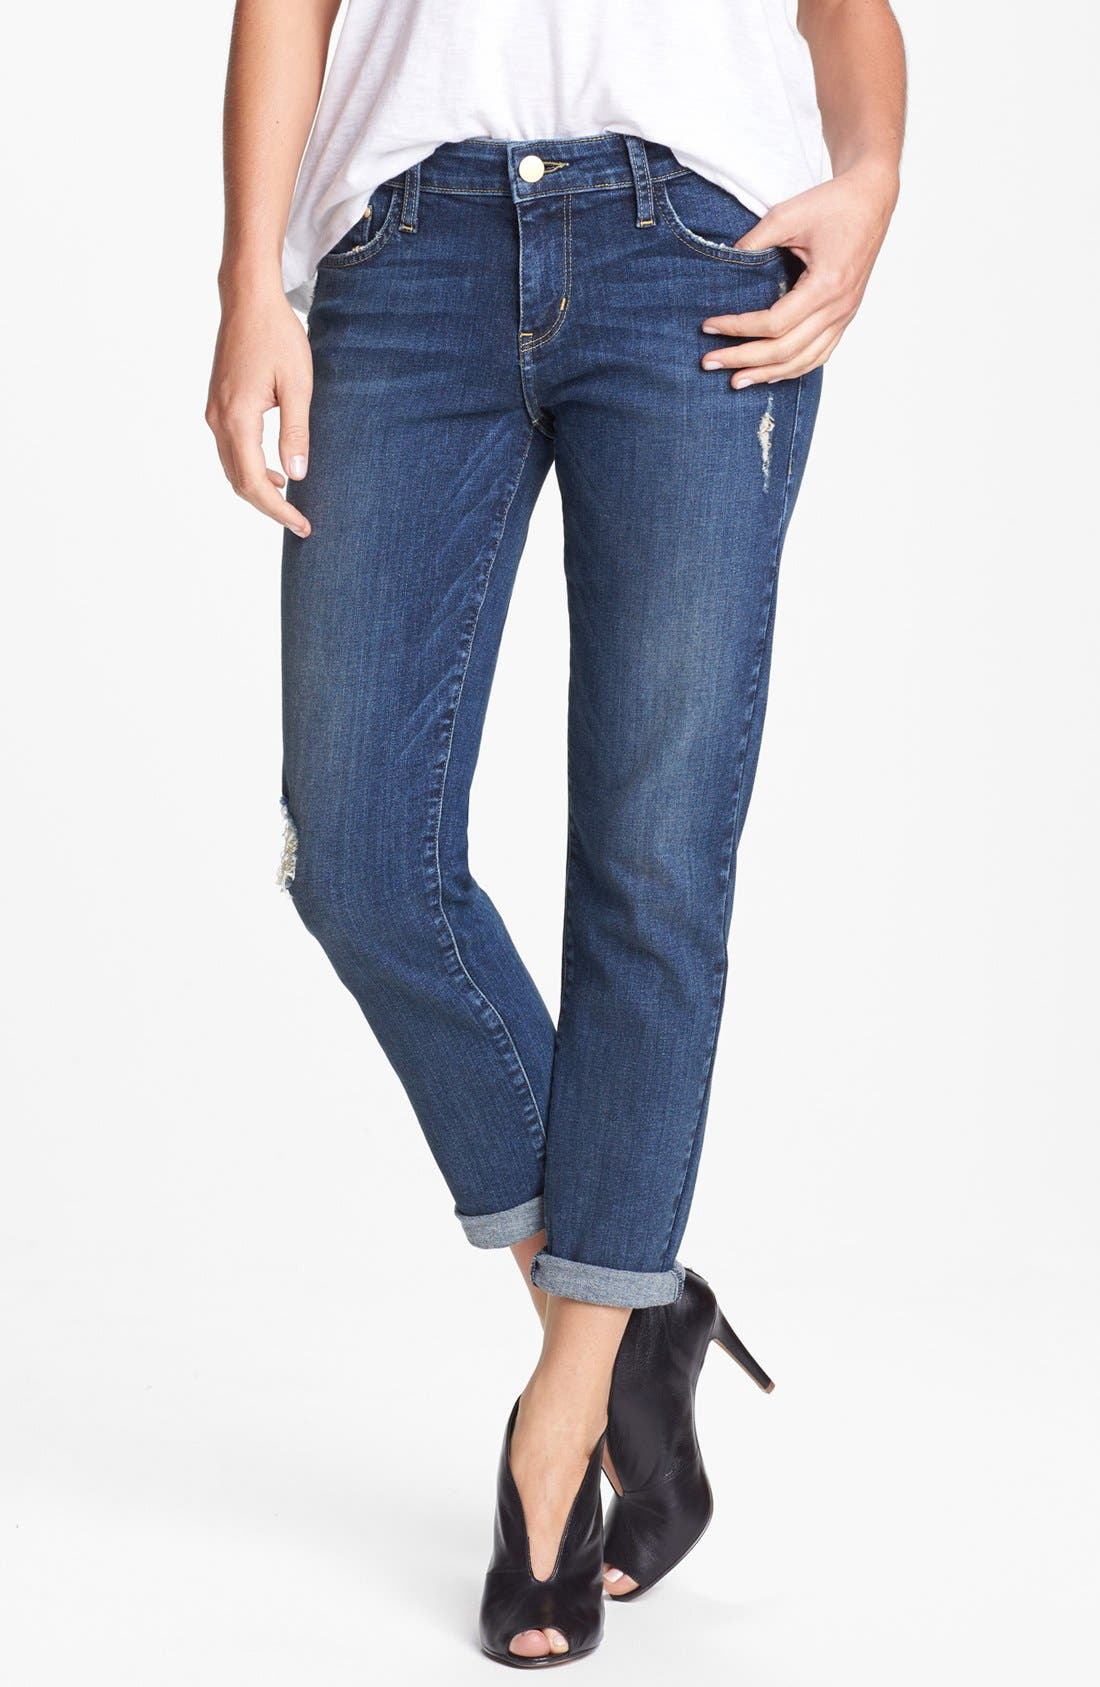 Main Image - !iT Collective 'Hepburn' Stretch Boyfriend Jeans (Mac Coy)